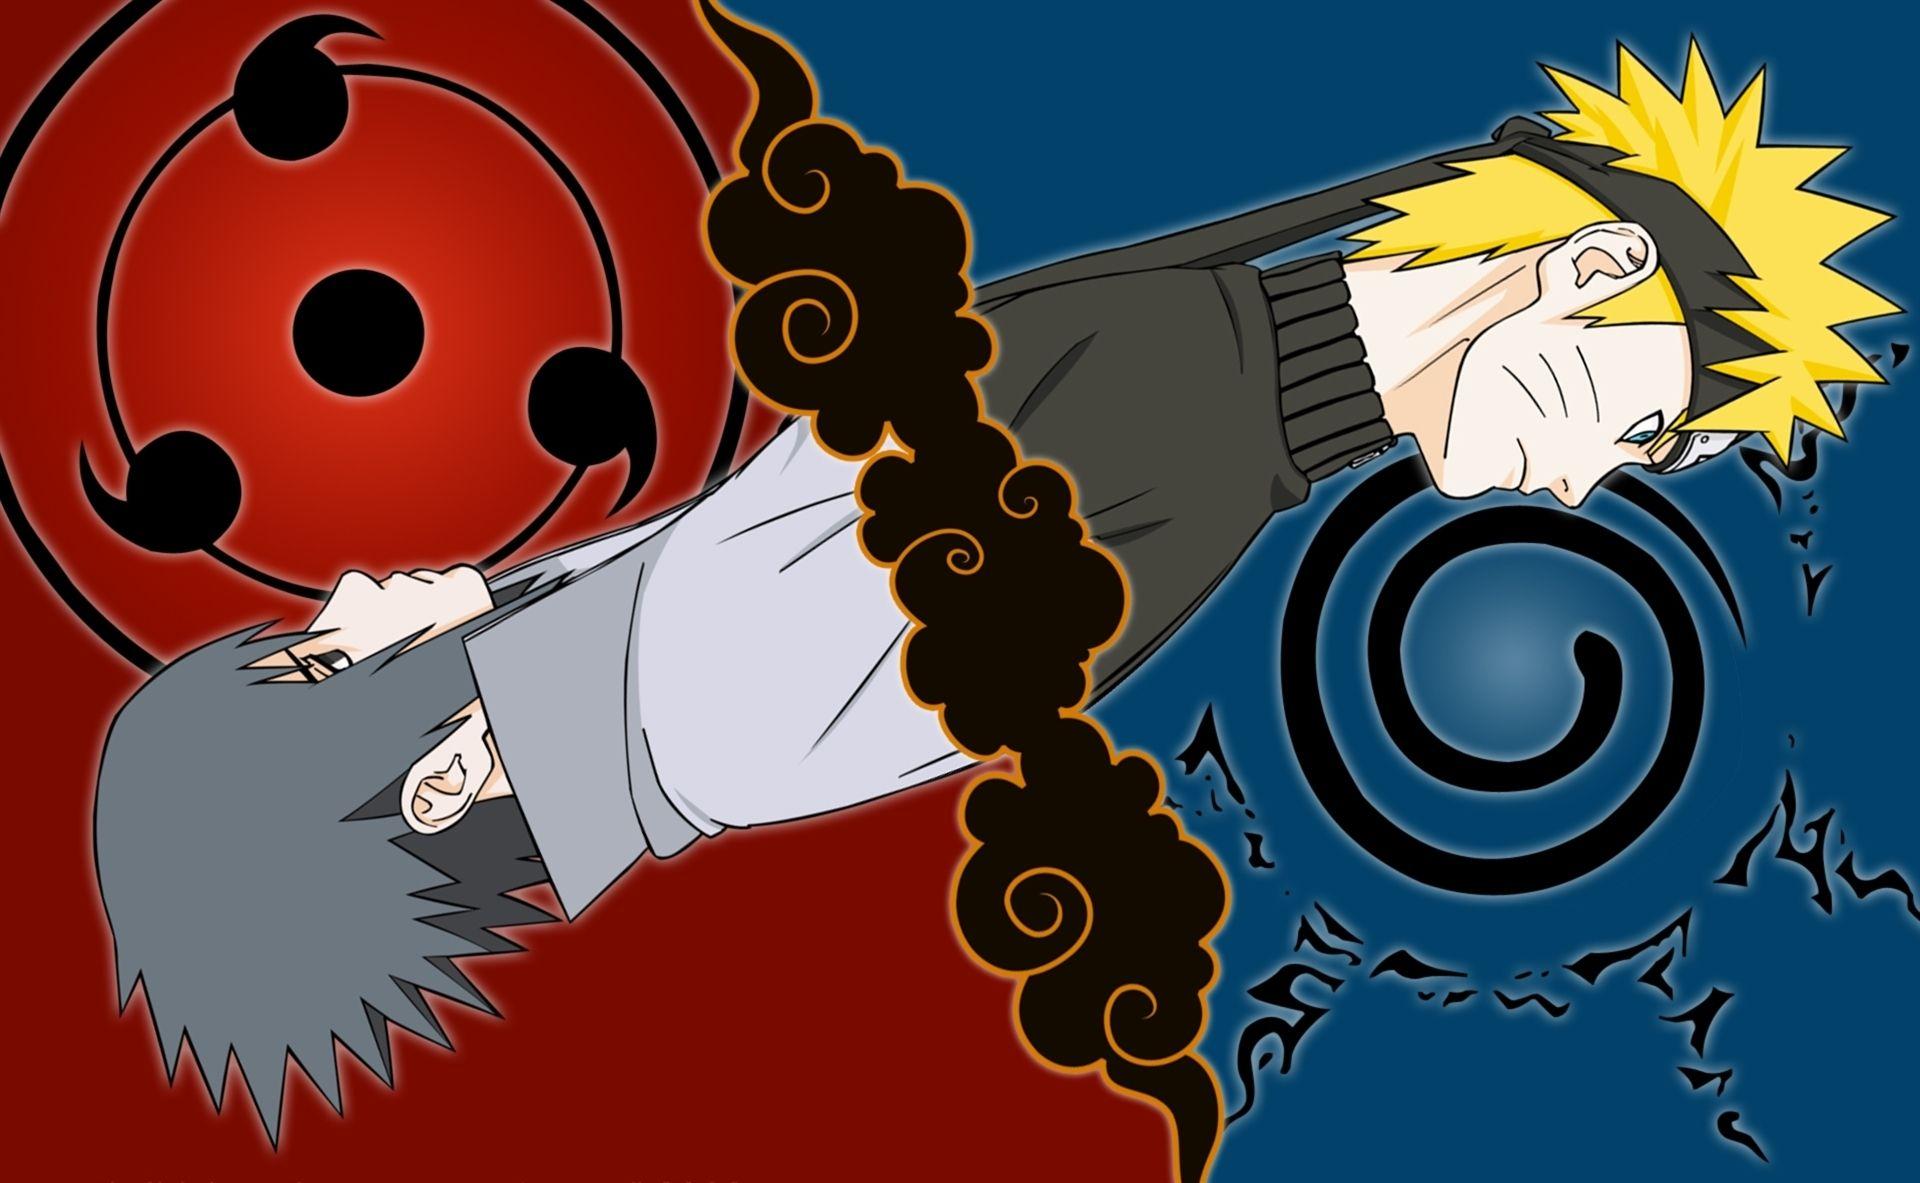 Naruto Wallpaper Pc Hd